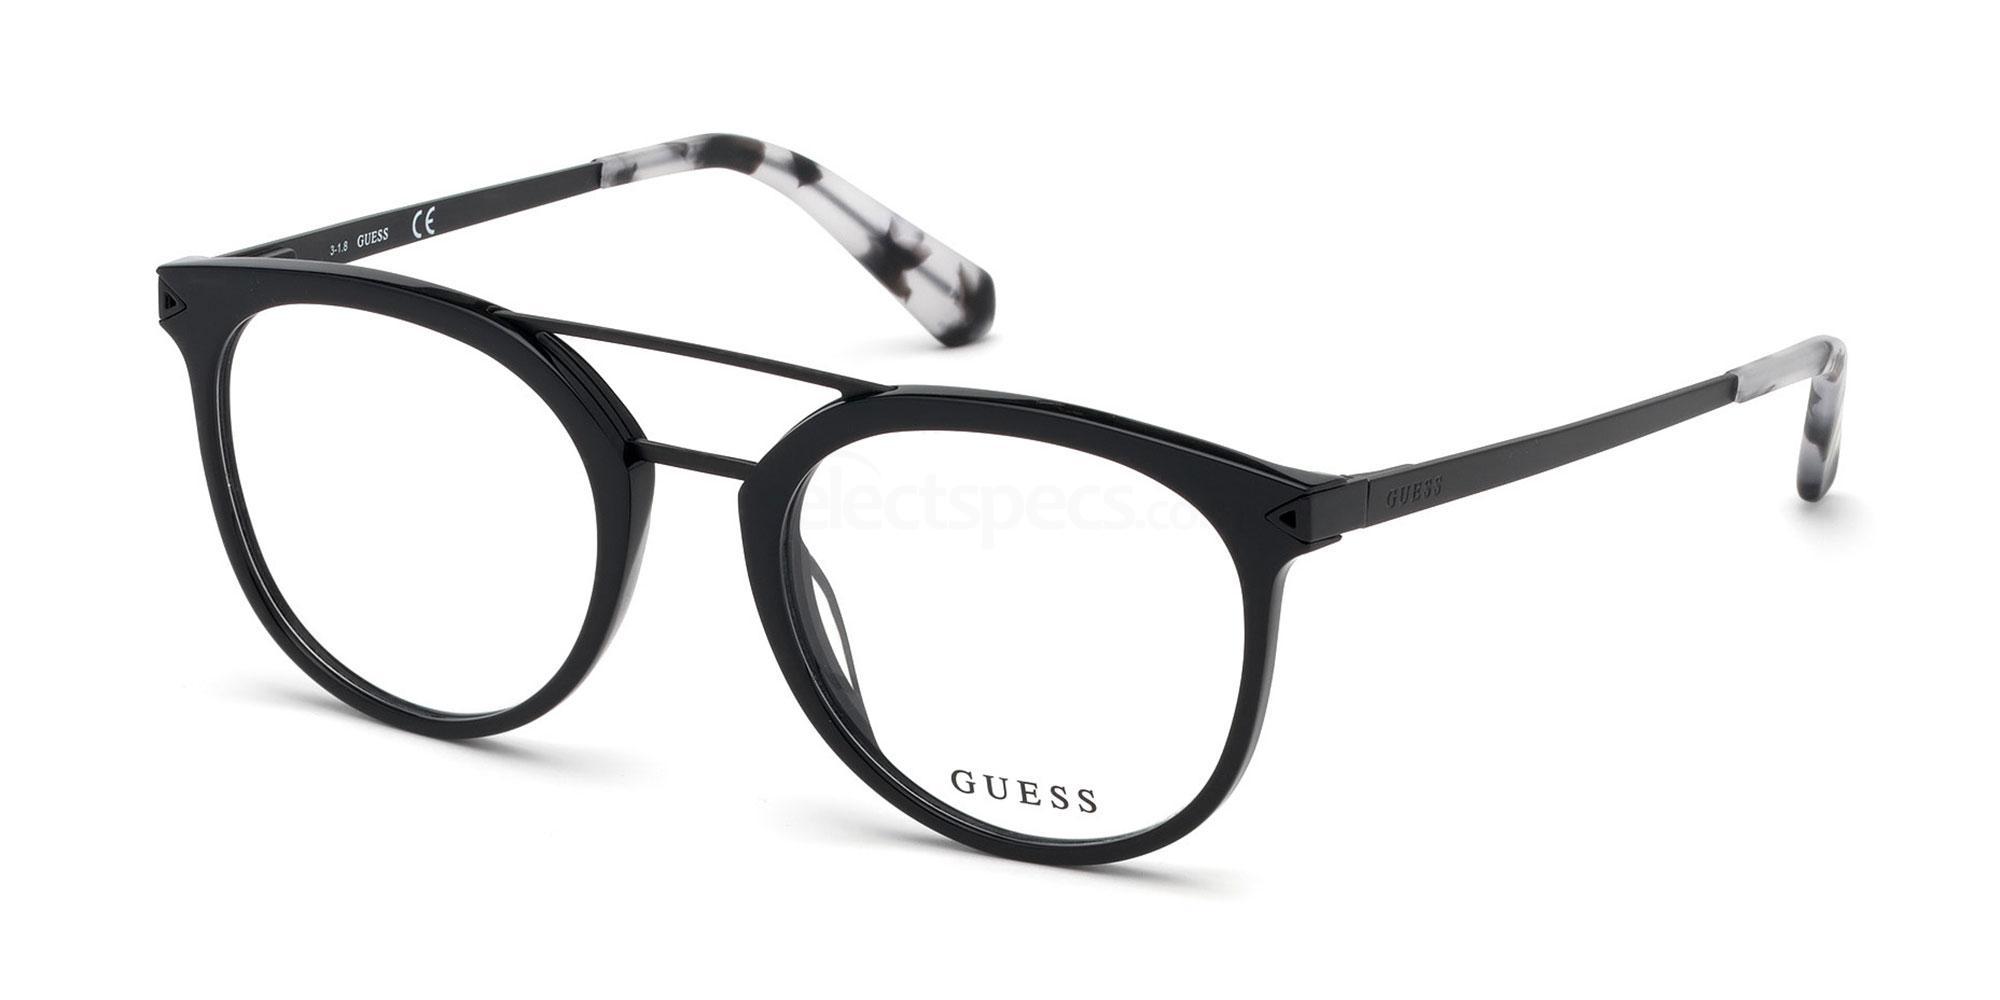 005 GU1964 Glasses, Guess